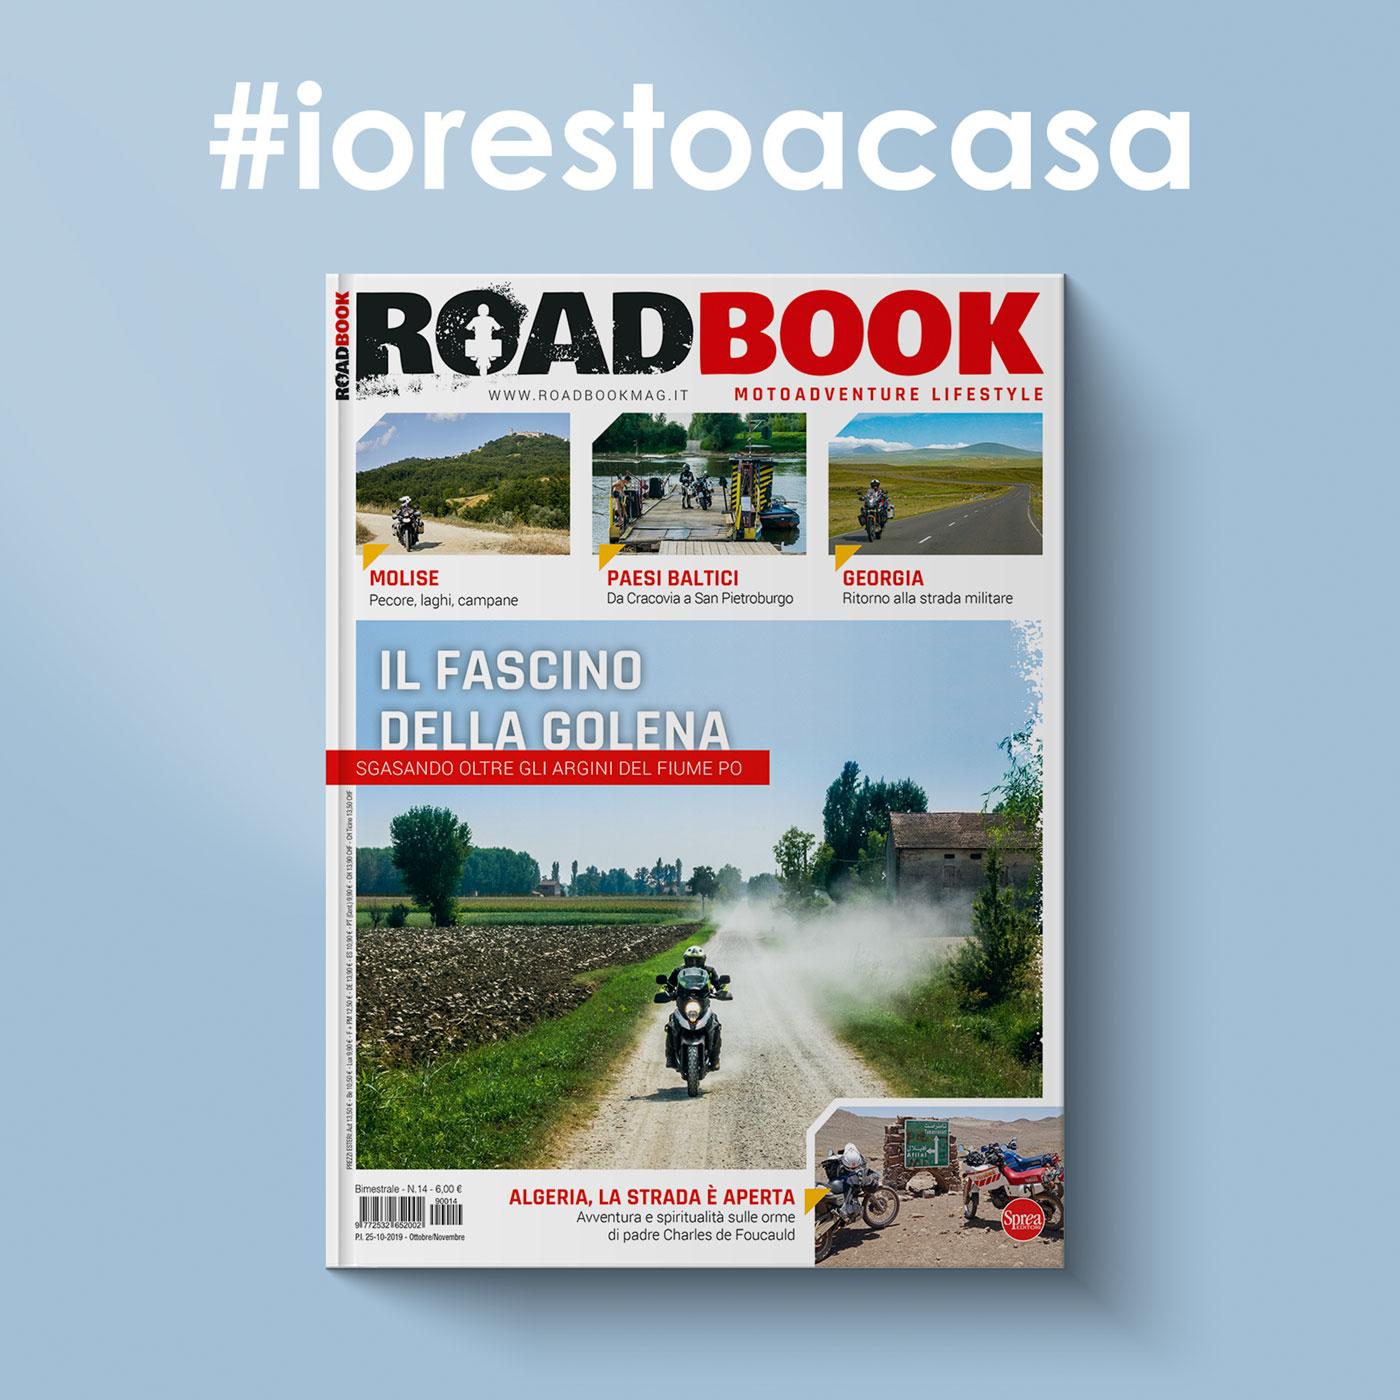 #iorestoacasa con RoadBook